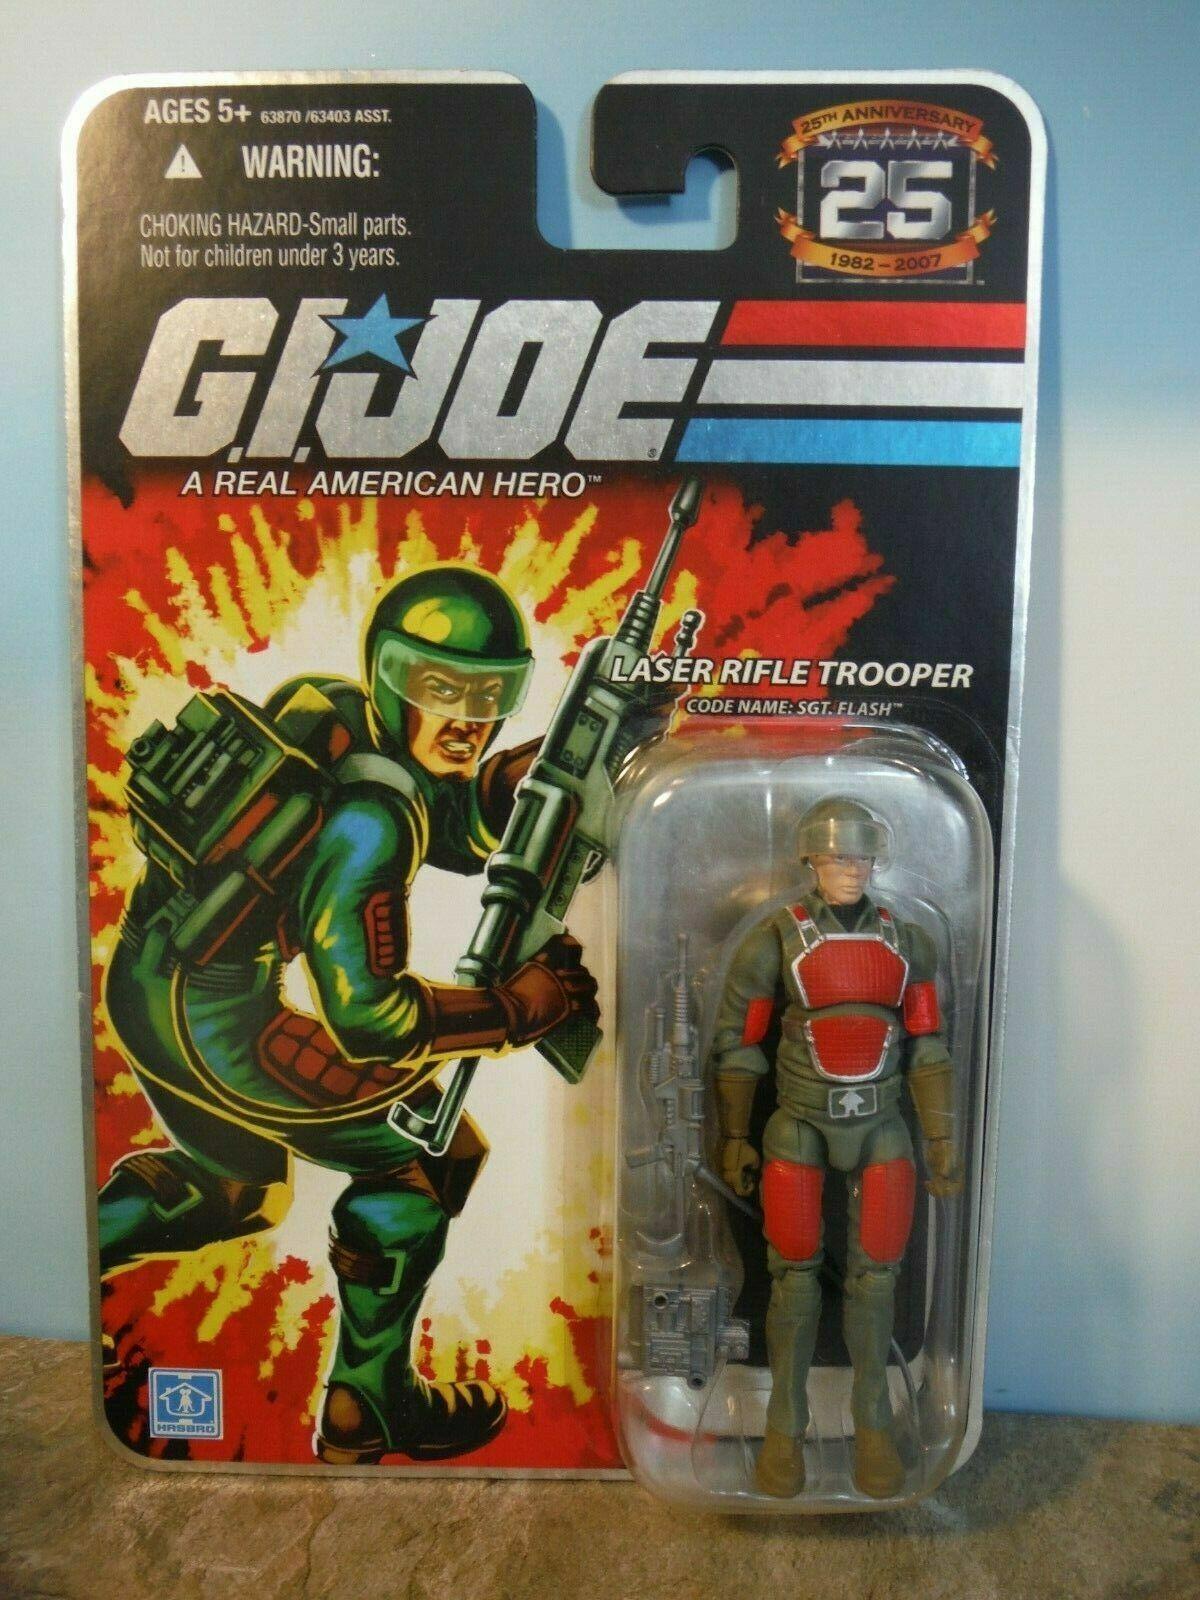 Joe Cobra 25th Anniversary MOC Foil Flash Laser Rifle Trooper 2008 G.I Sgt